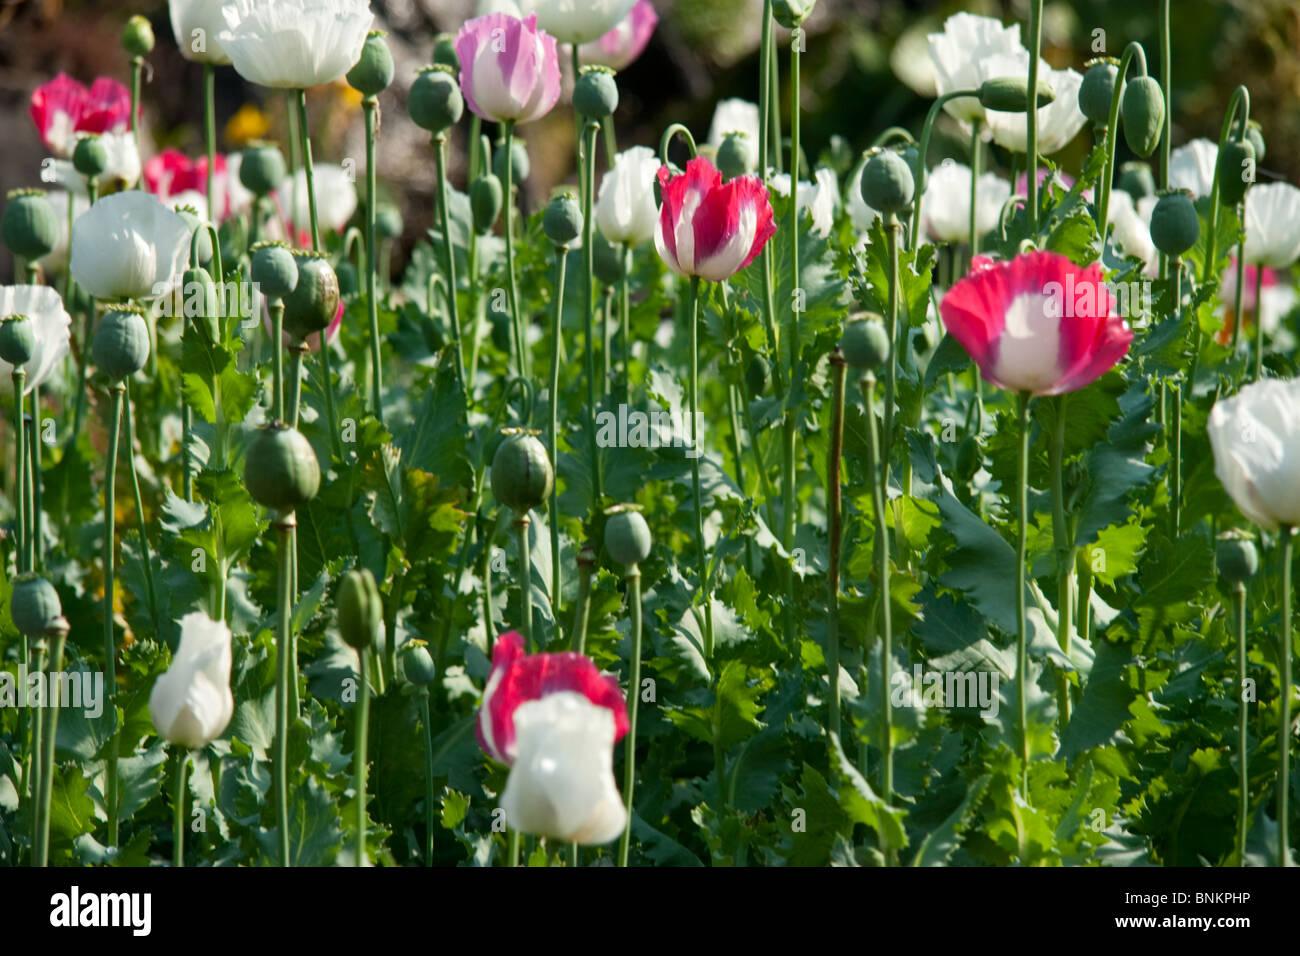 Opium poppy flowers chiang mai thailand stock photo 30552978 alamy opium poppy flowers chiang mai thailand mightylinksfo